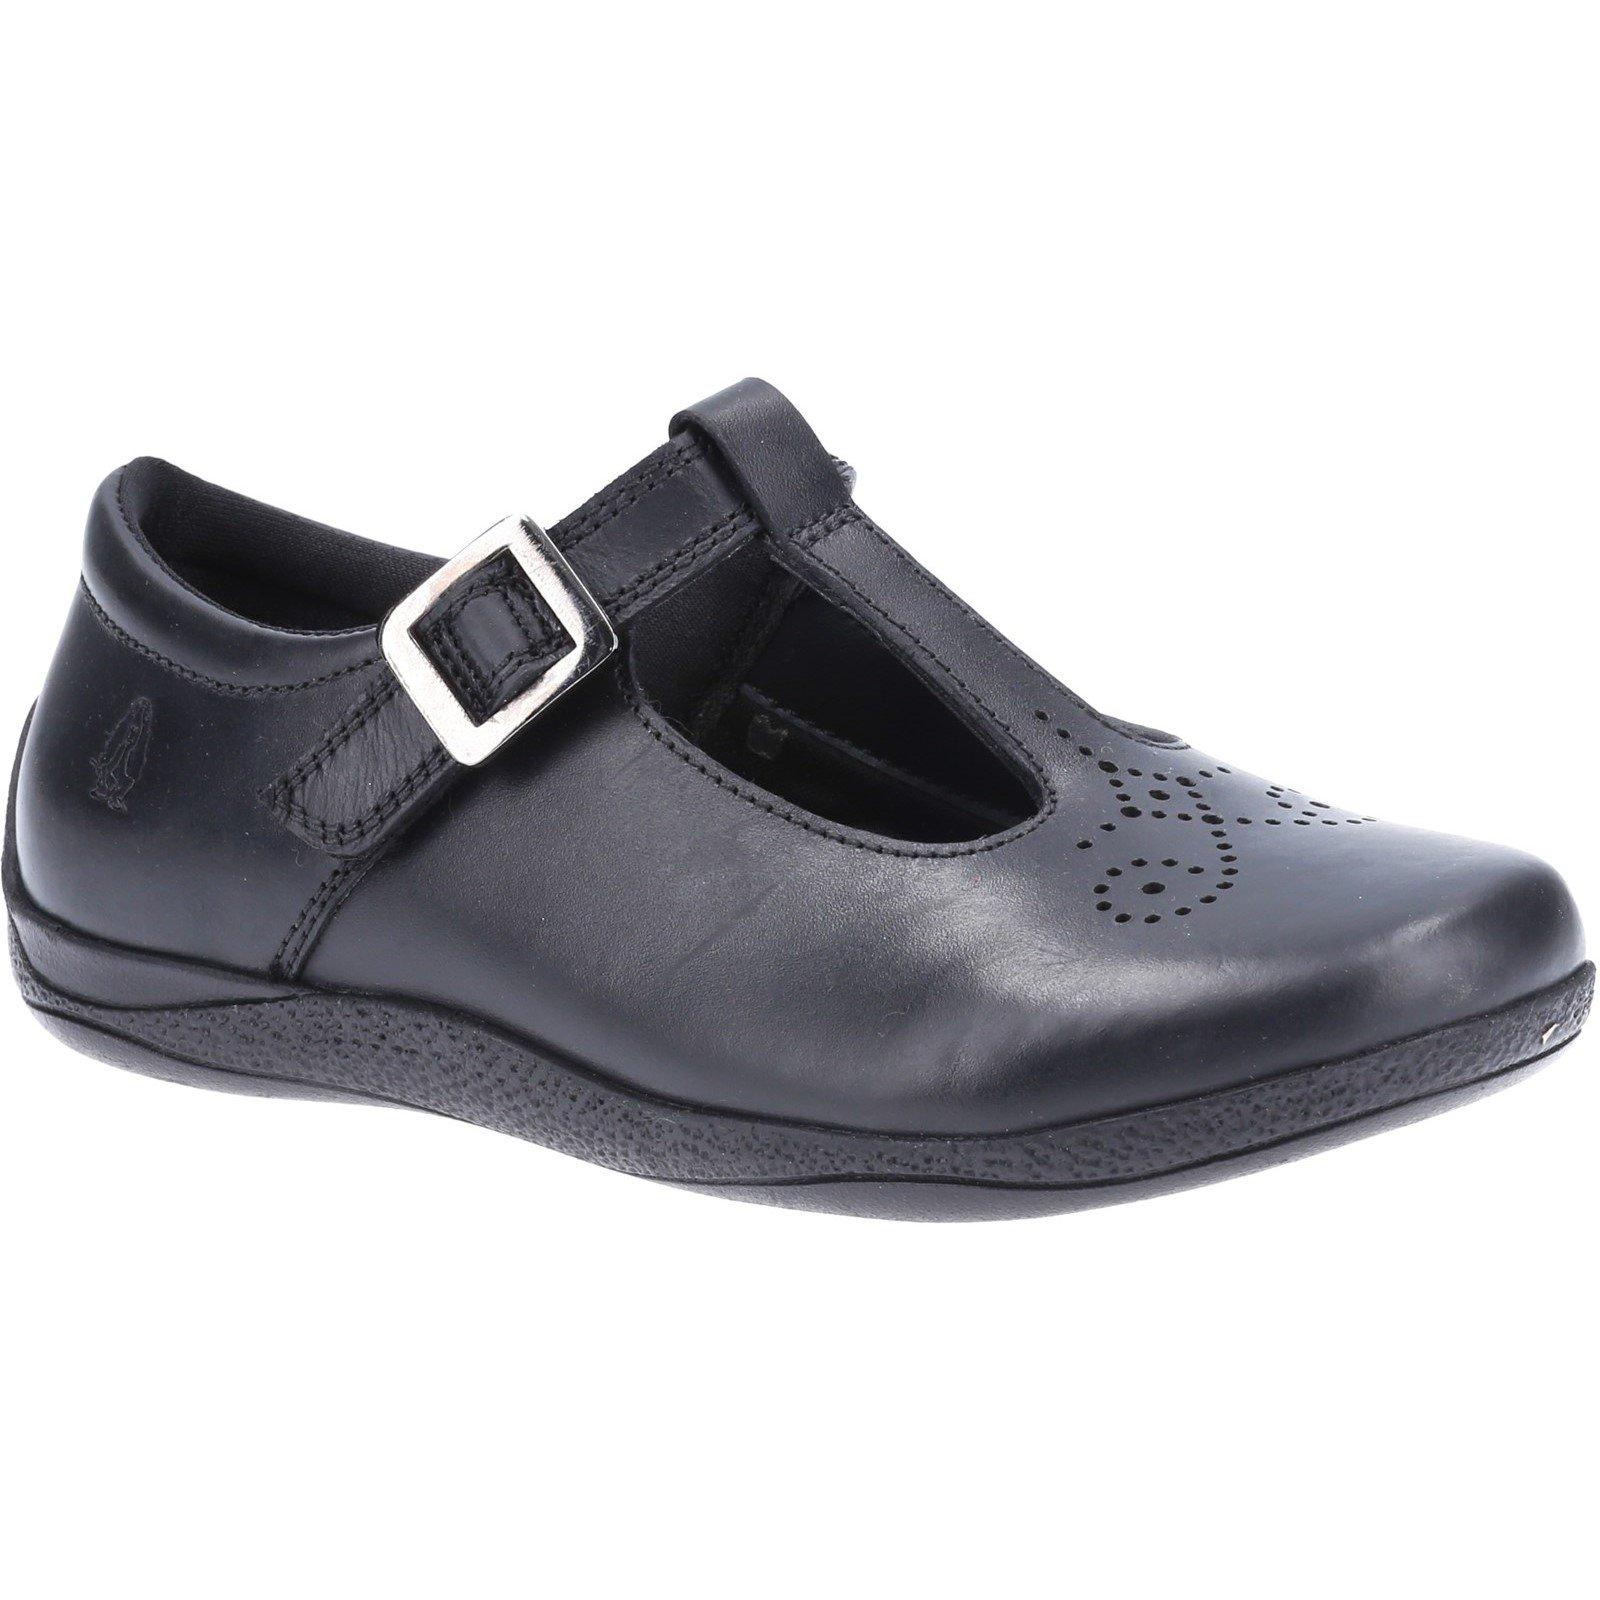 Hush Puppies Kid's Eliza Senior School Shoe Black 32590 - Black 6